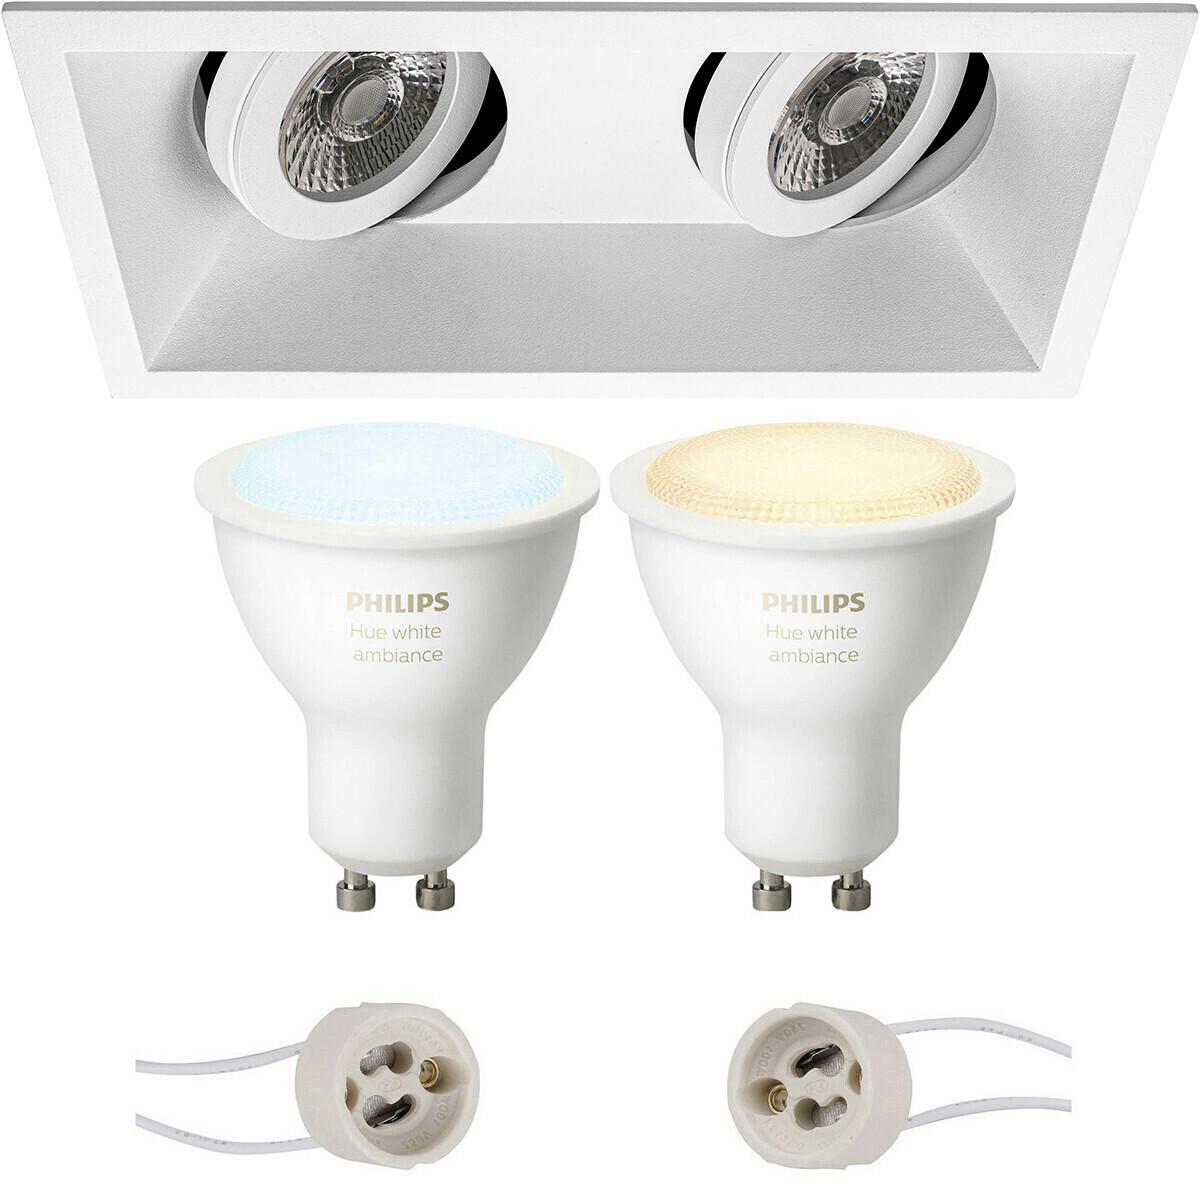 Pragmi Zano Pro - Inbouw Rechthoek Dubbel - Mat Wit - Kantelbaar - 185x93mm - Philips Hue - LED Spot